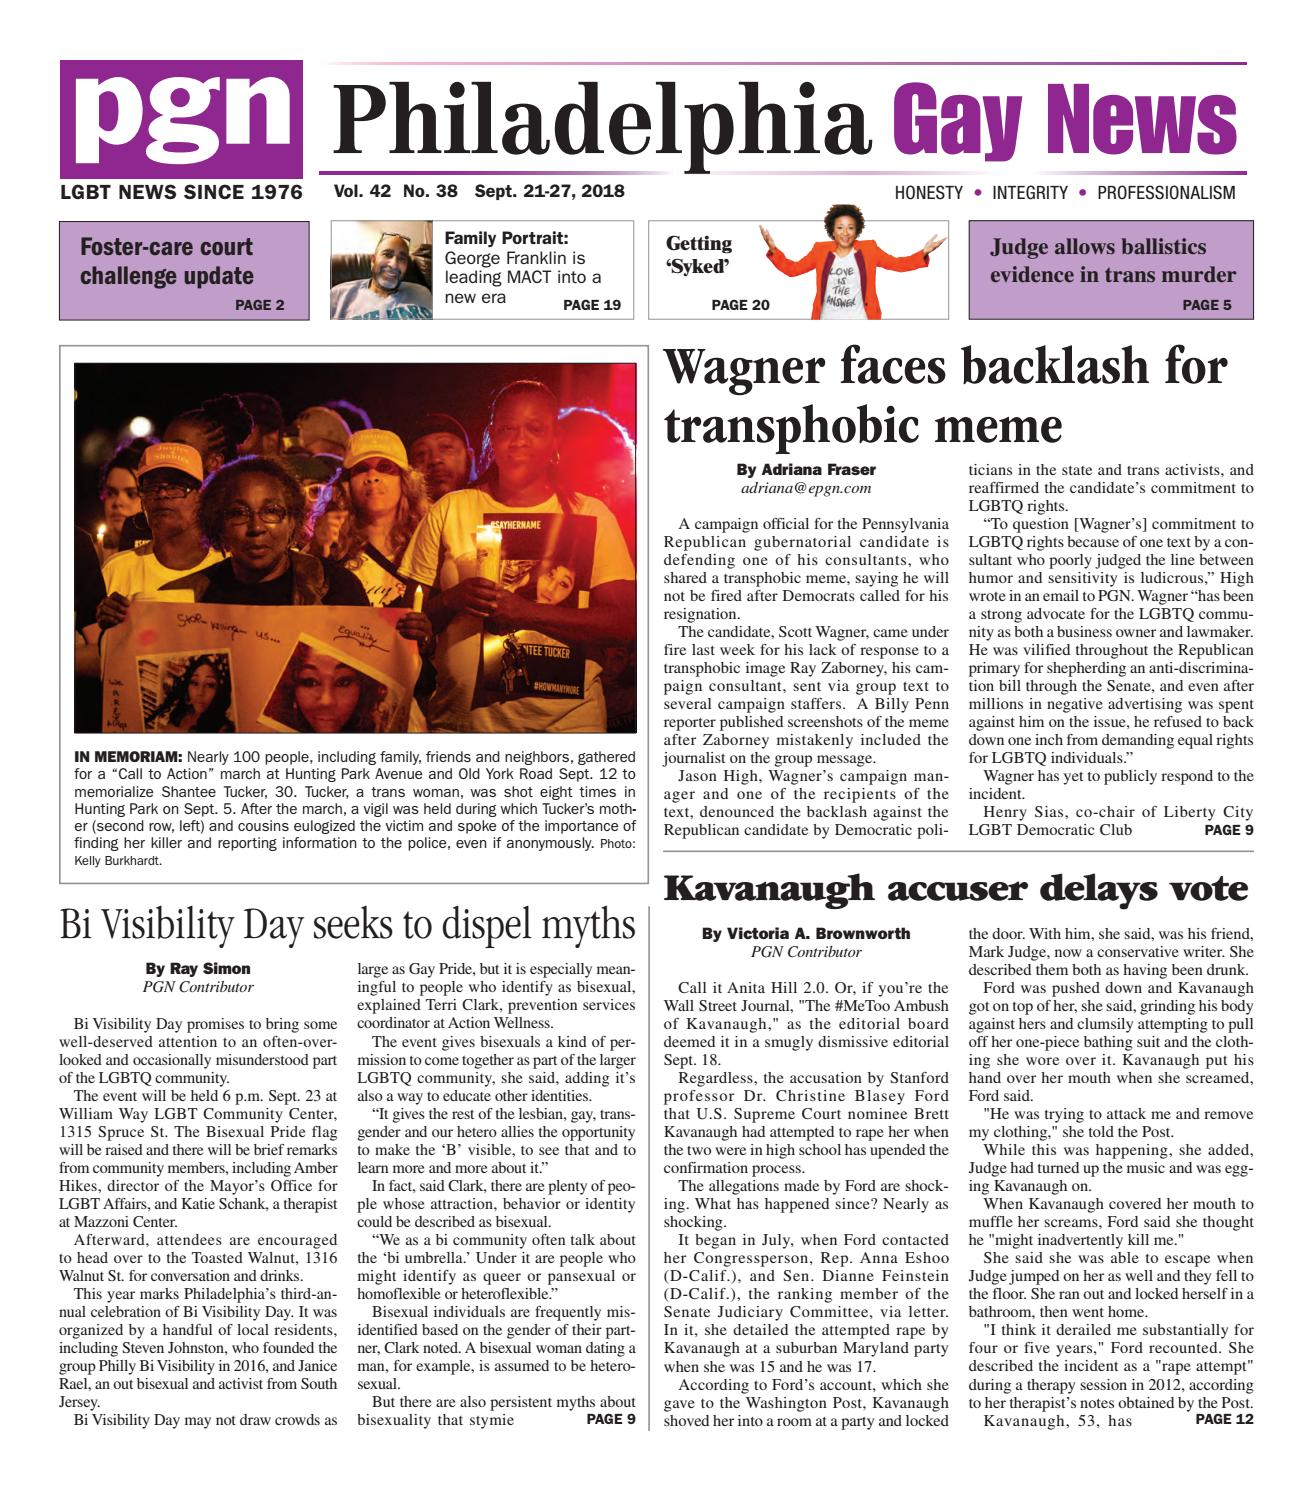 da070bfe3 PGN Sept. 21 - 27, 2018 by The Philadelphia Gay News - issuu